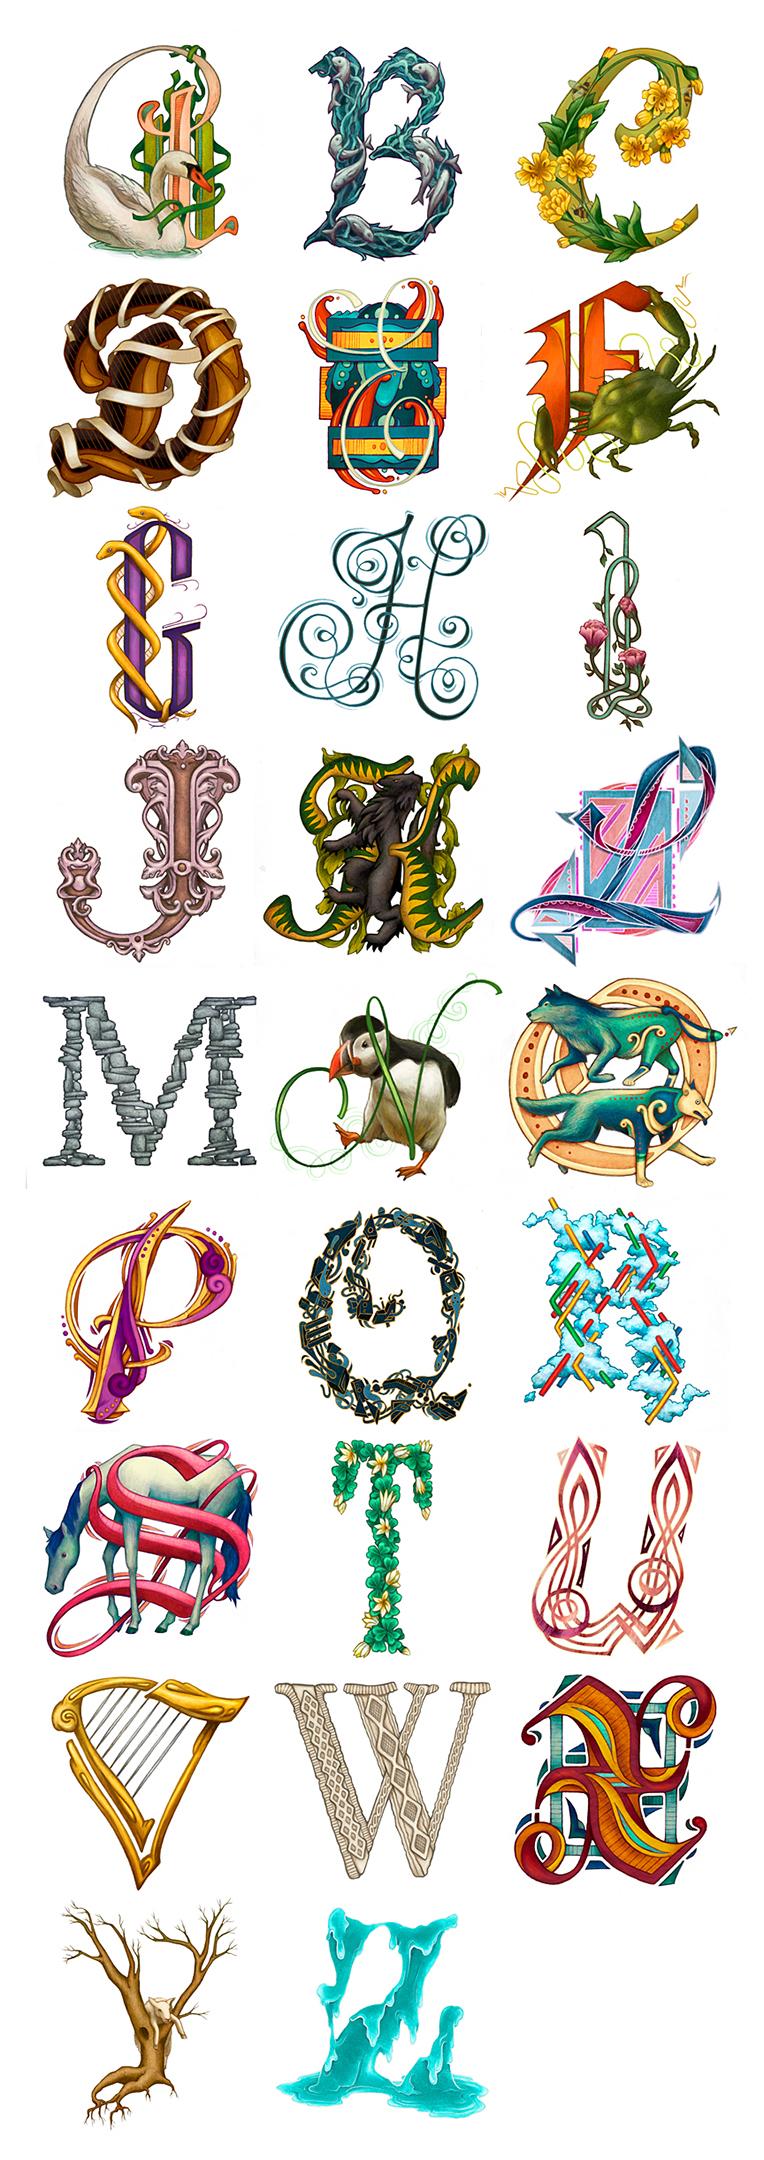 Alfabeto ilustrado con animales y plantas creado por la ilustradora kate-ohara